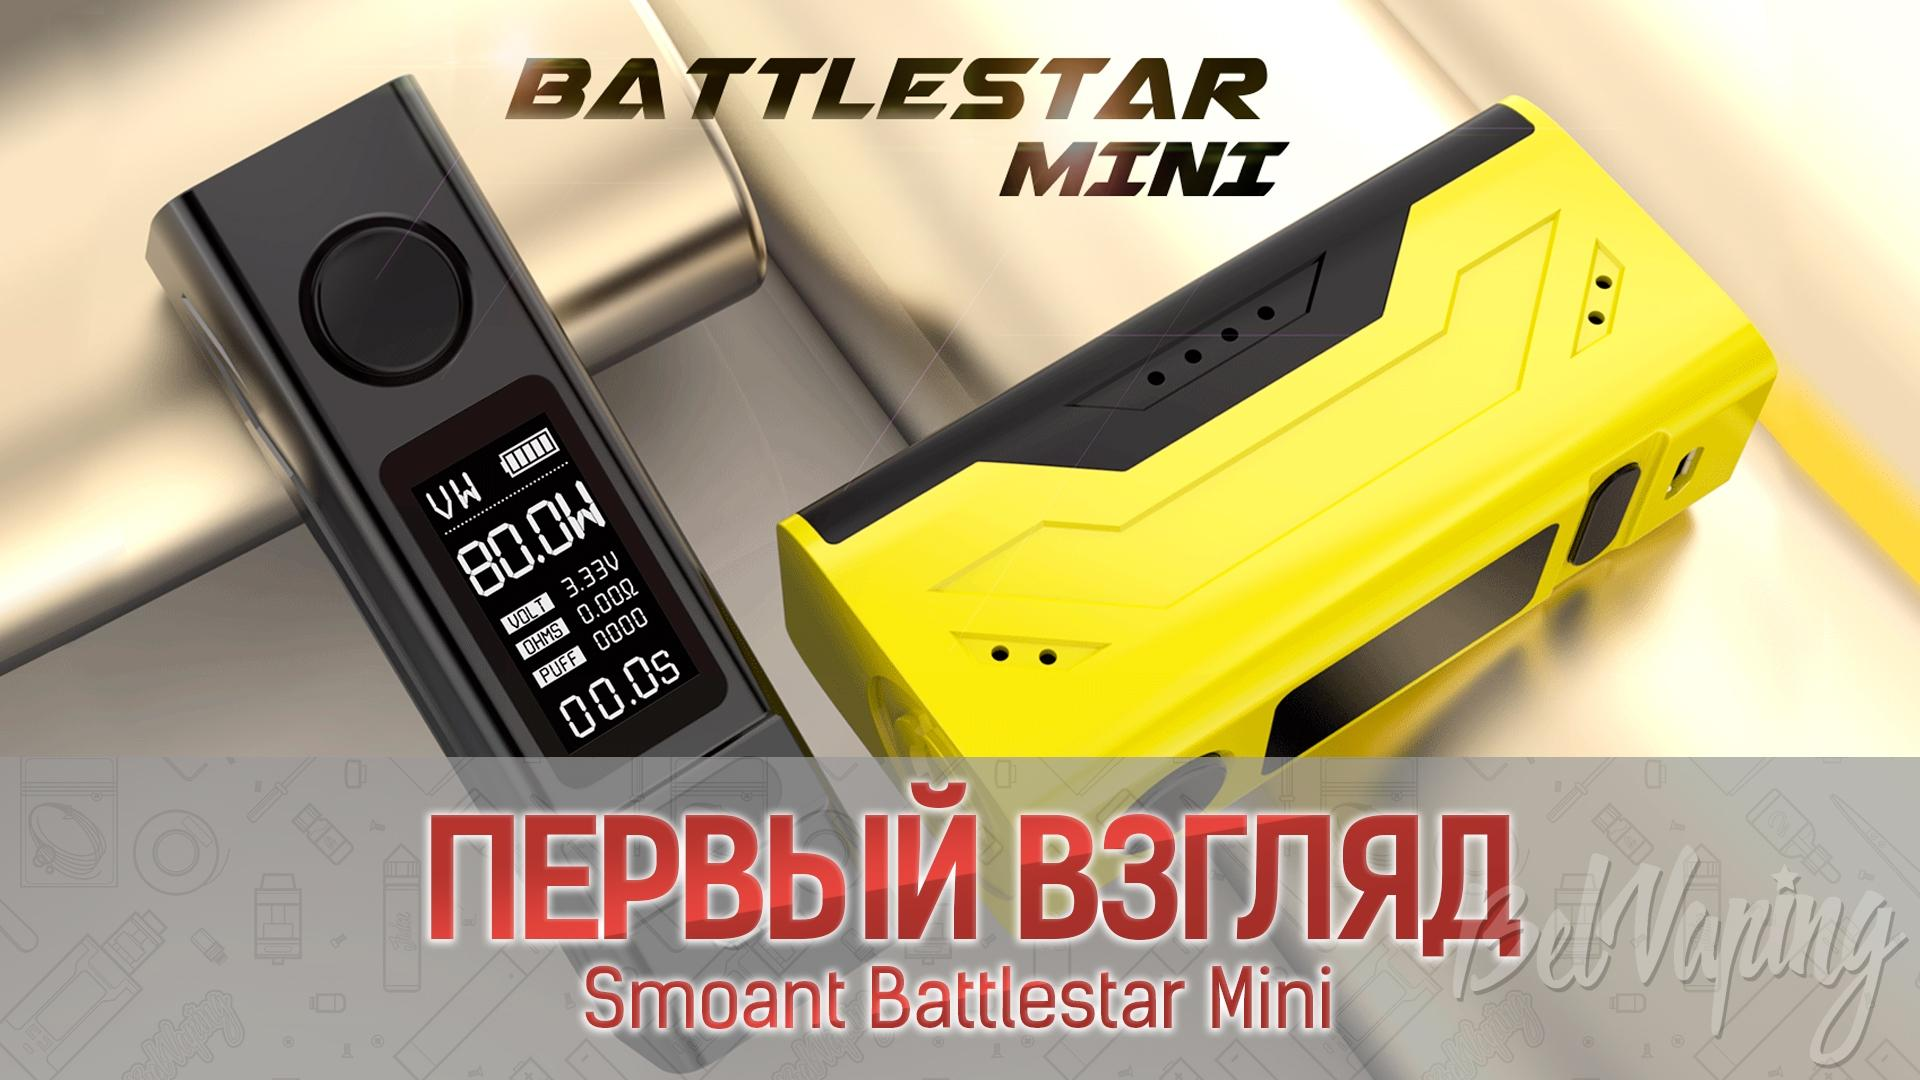 Smoant Battlestar Mini. Первый взгляд